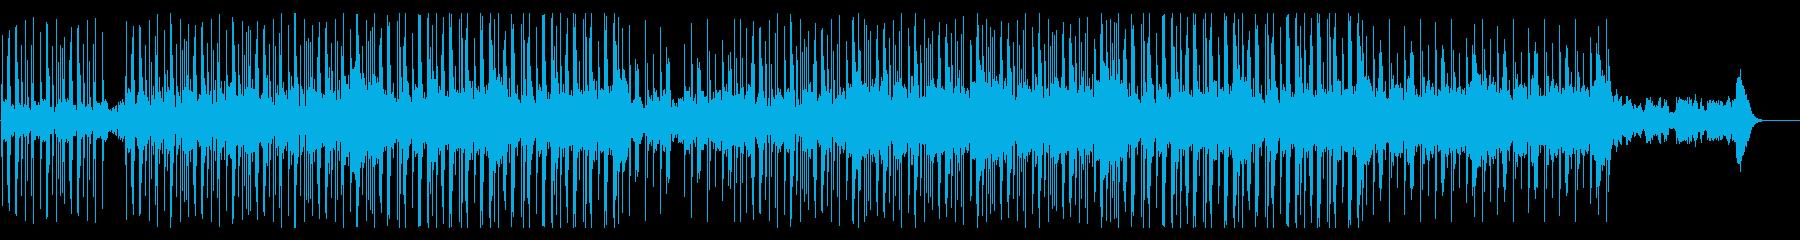 HIPHOPトラック/和風/JAPANの再生済みの波形